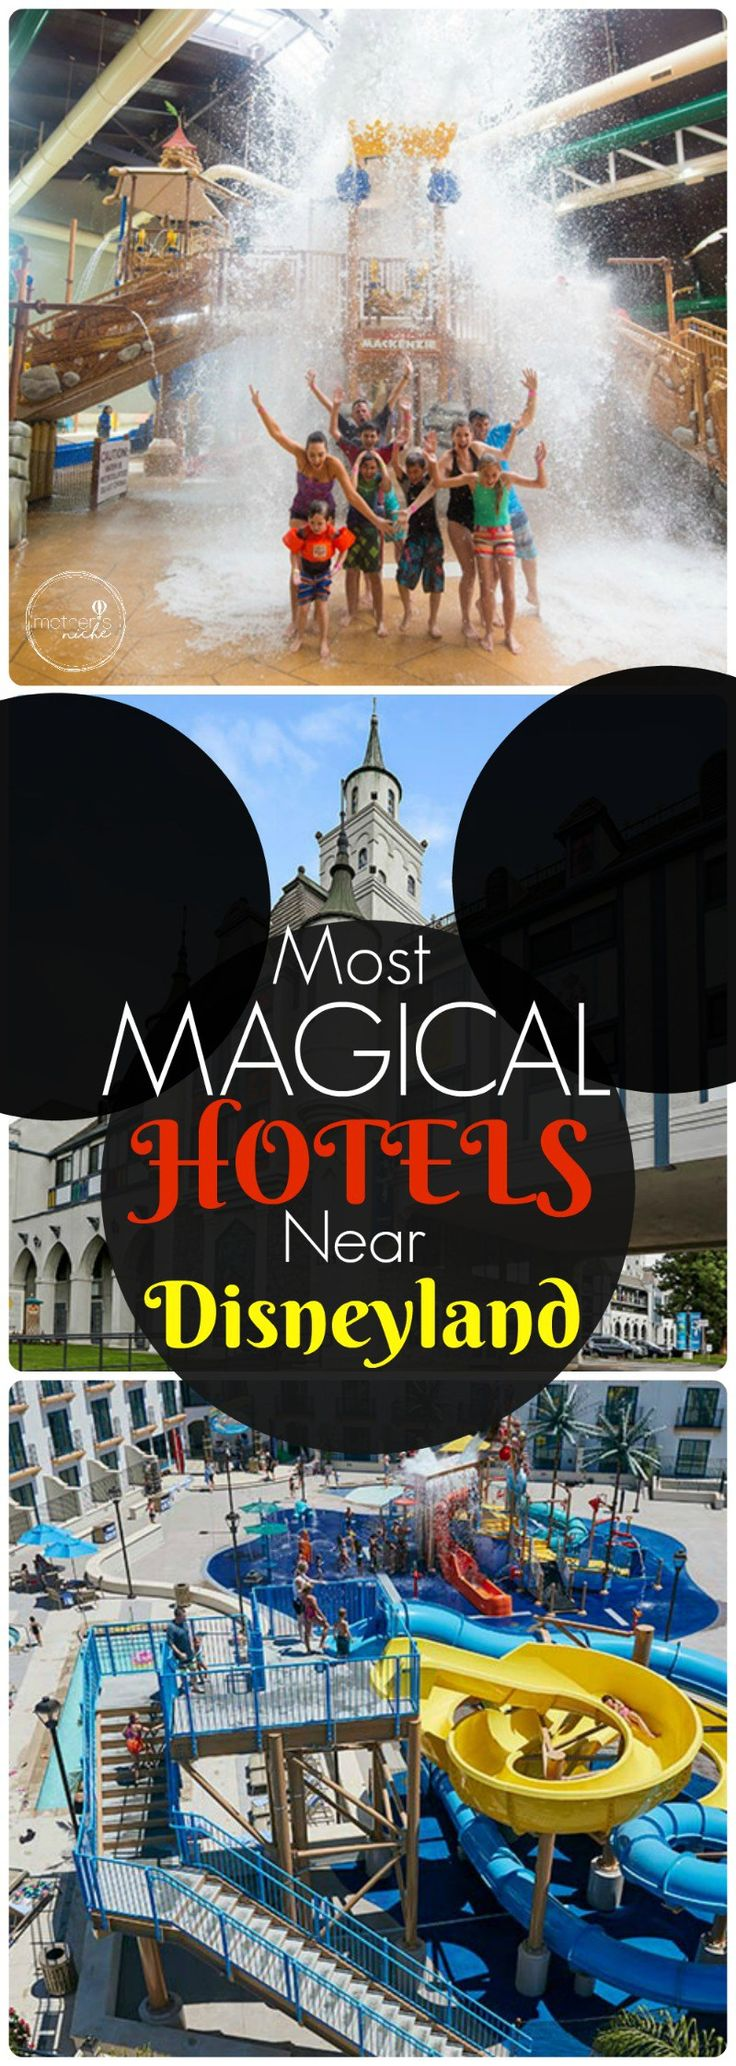 Magical Hotels Near Disneyland